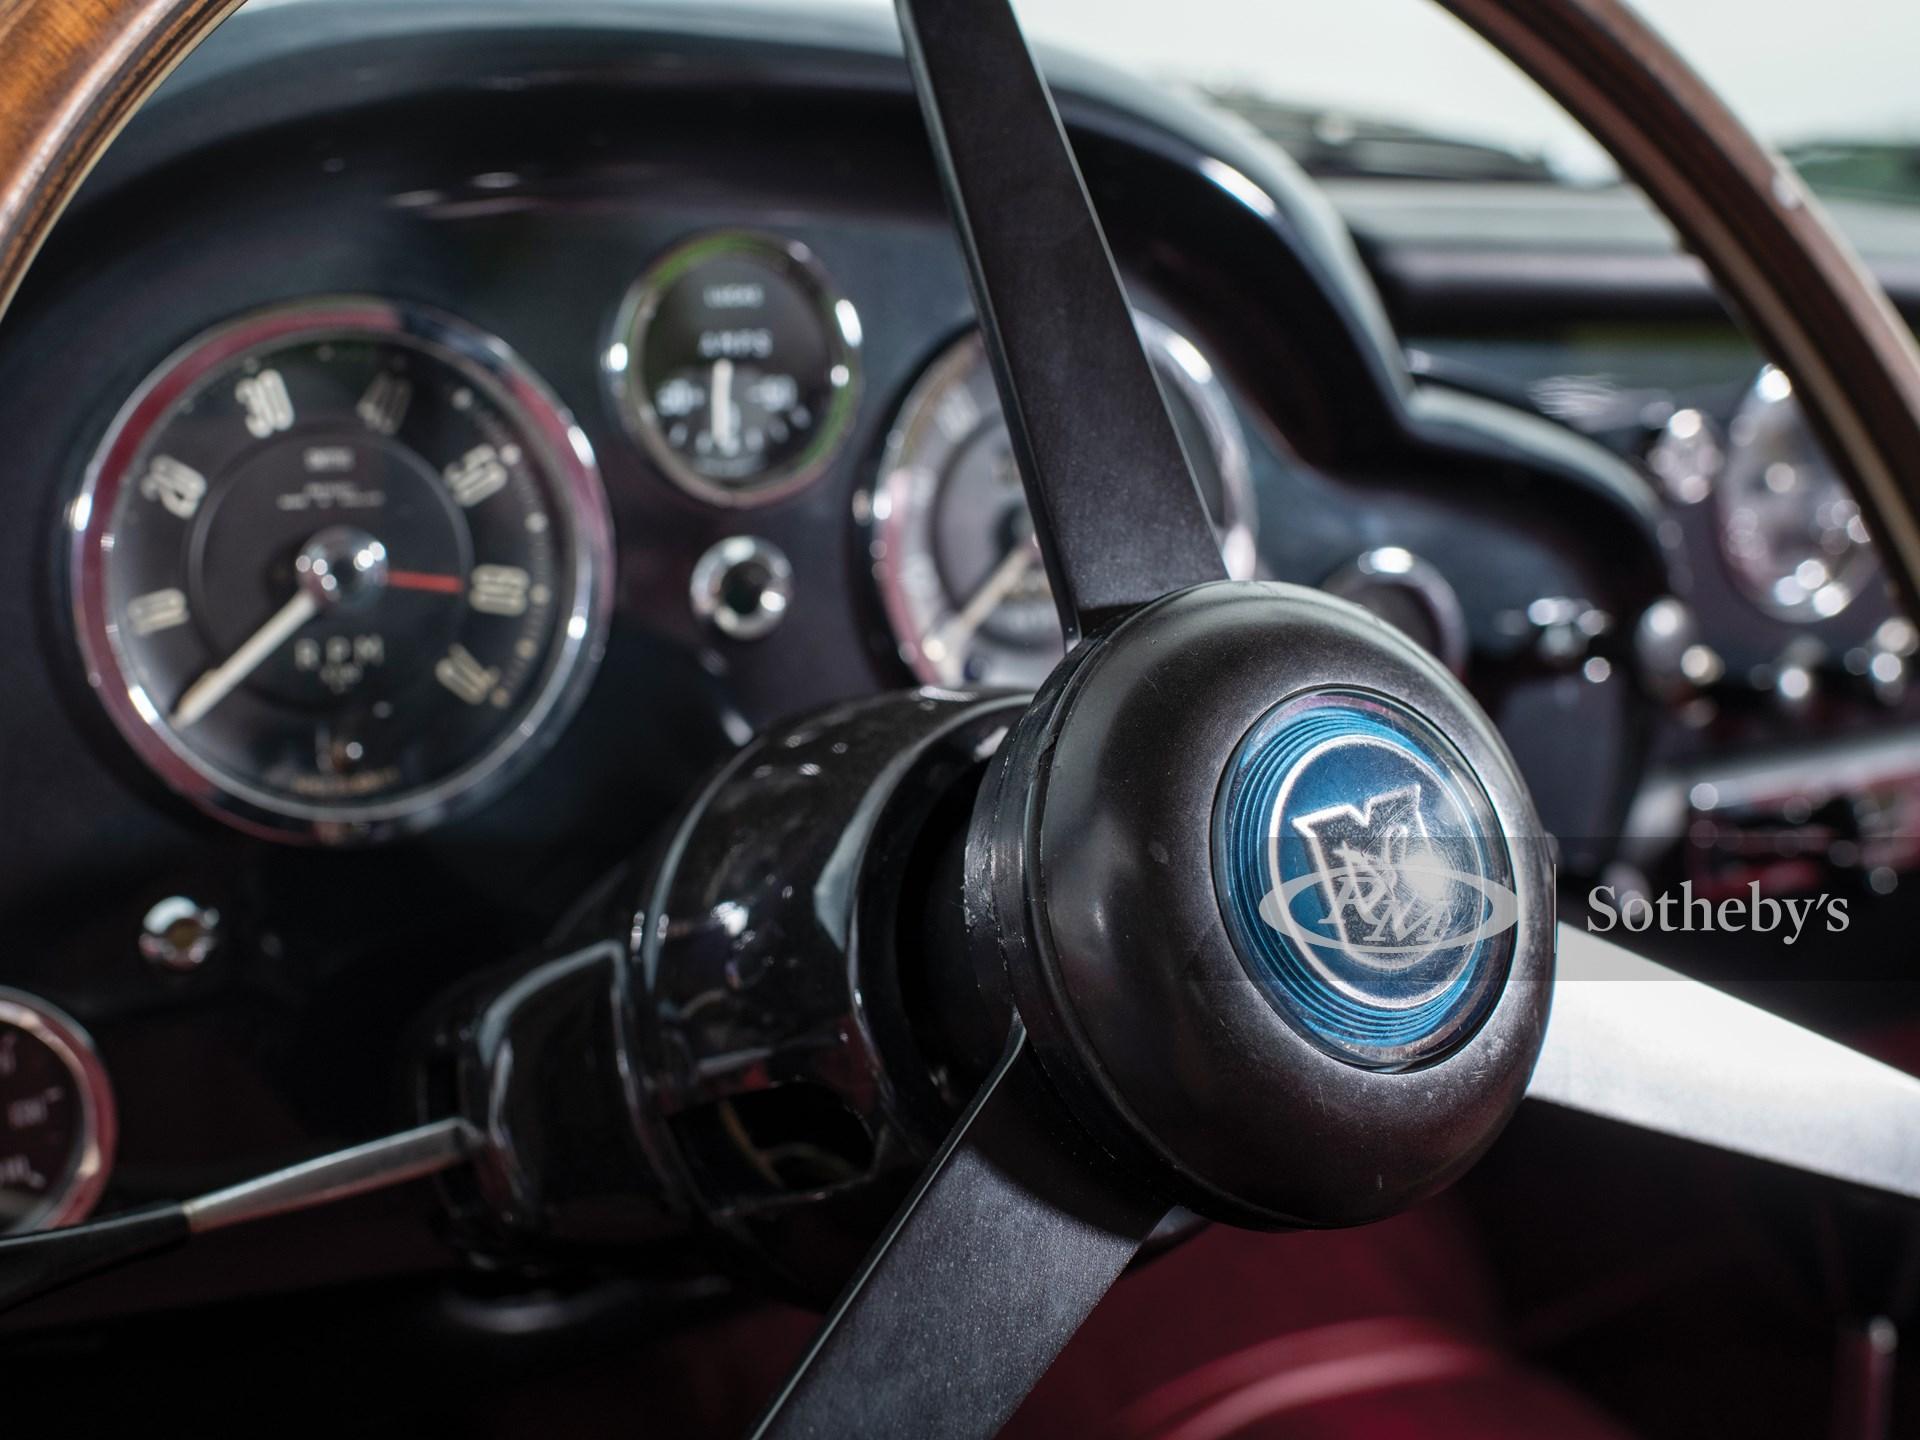 1962 Aston Martin DB4 'GT Engine' Series IV  -